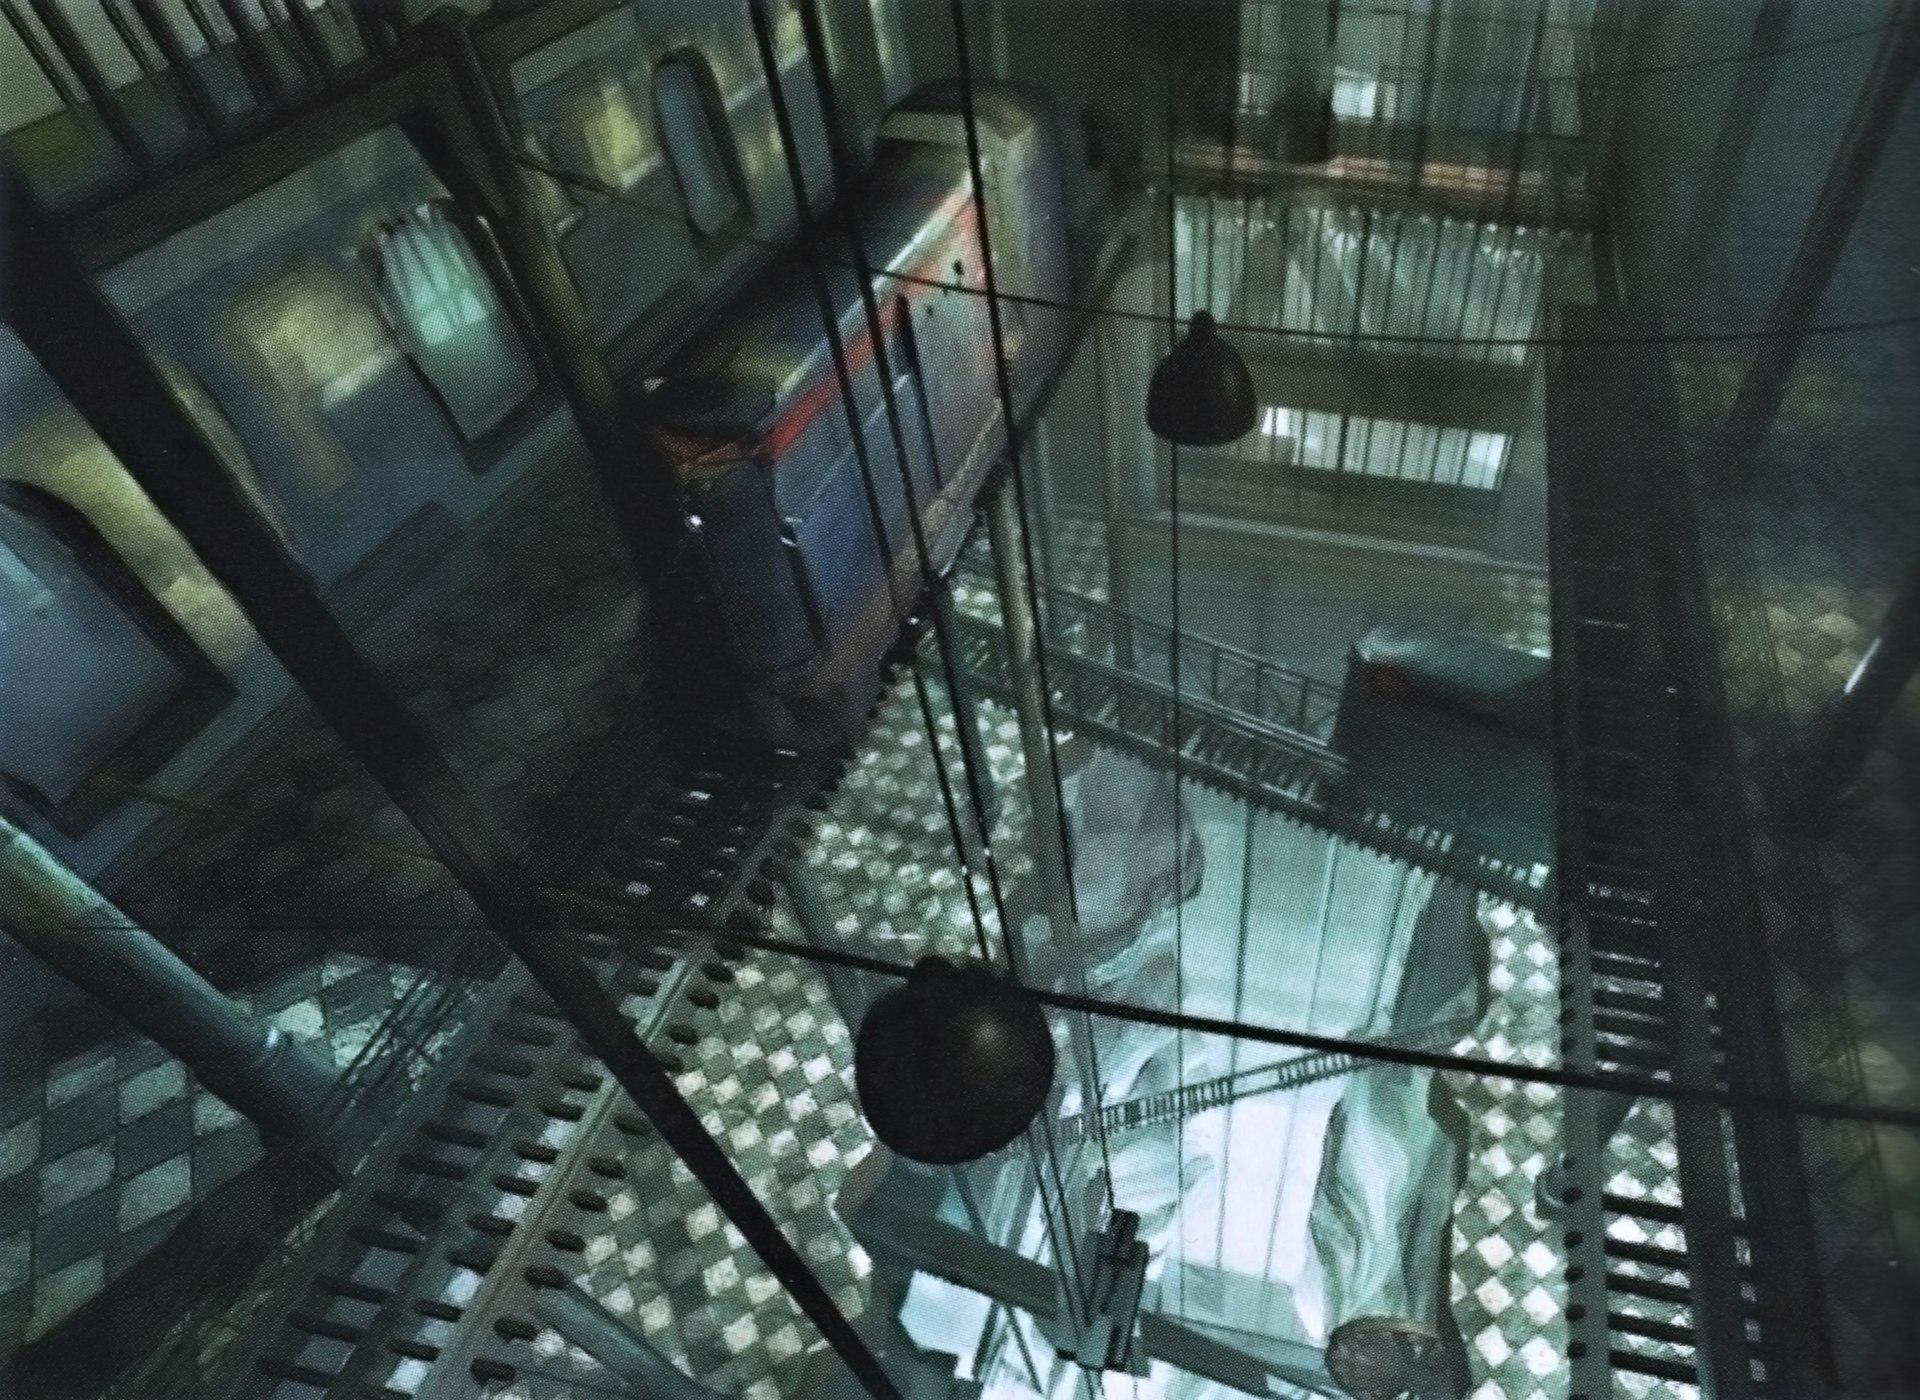 Half-Life 2 Cut Content V2 - Drama posts are week ban